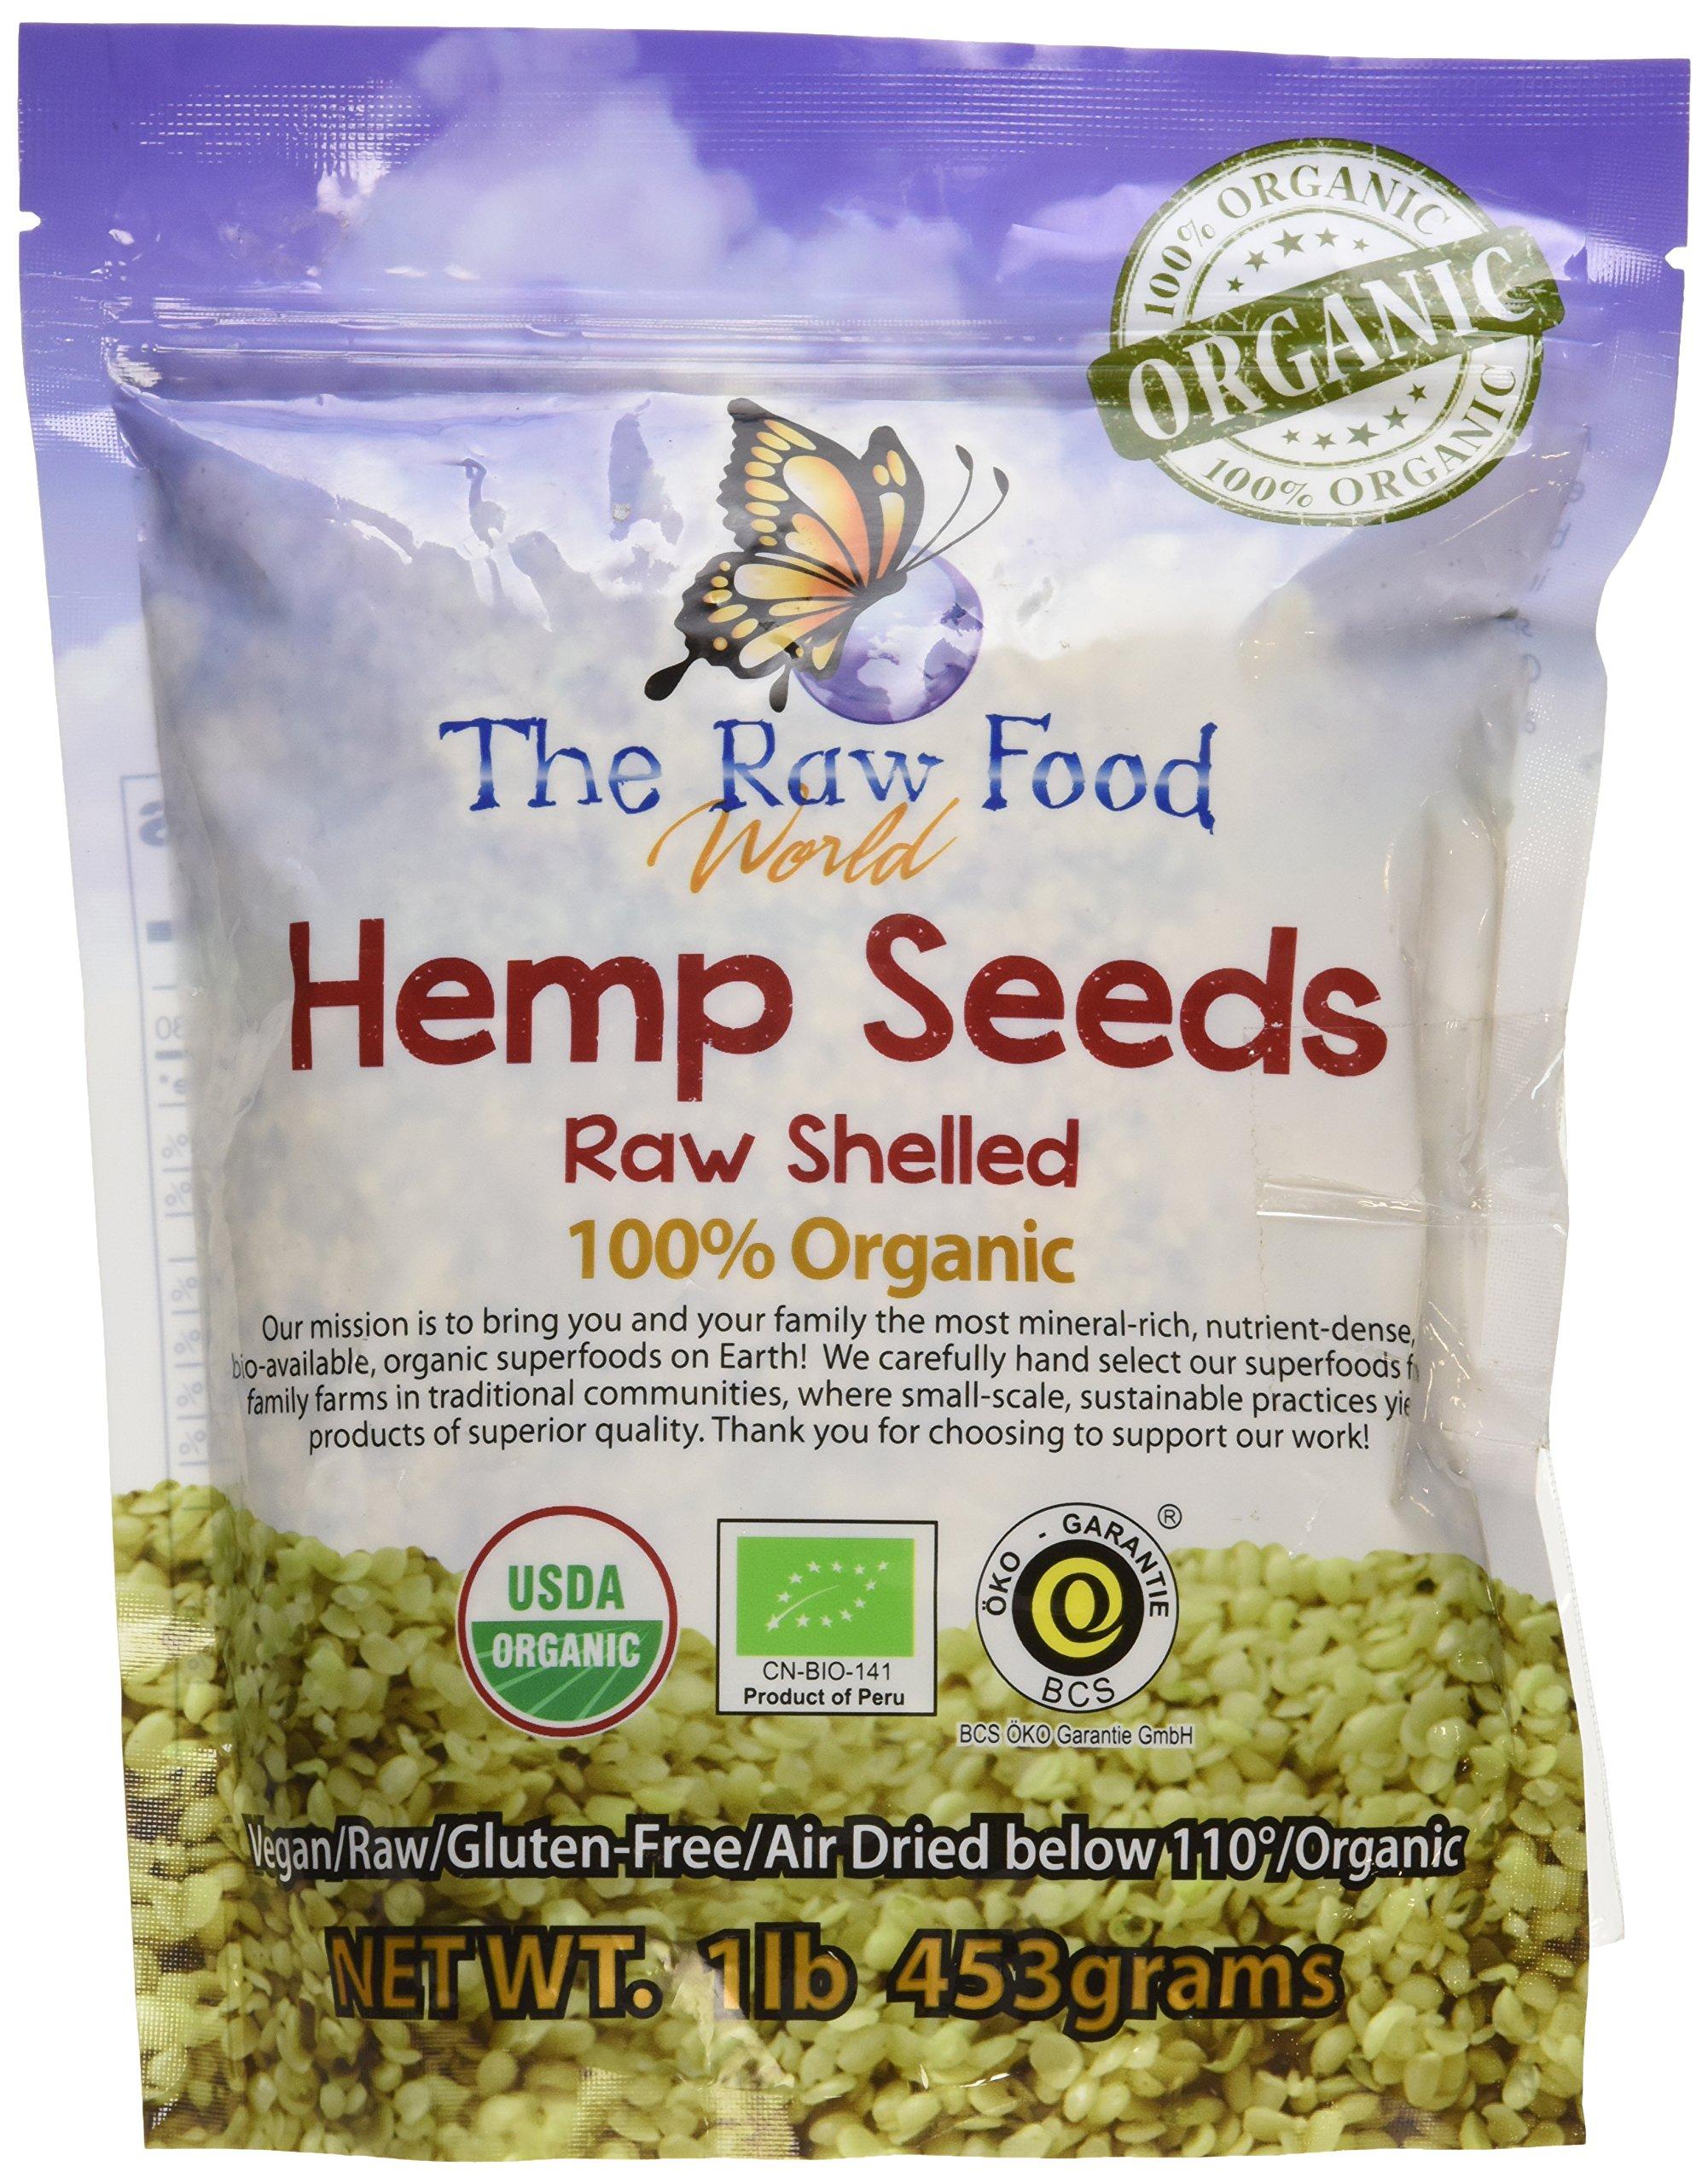 Organic Raw Hemp Seeds, 16oz